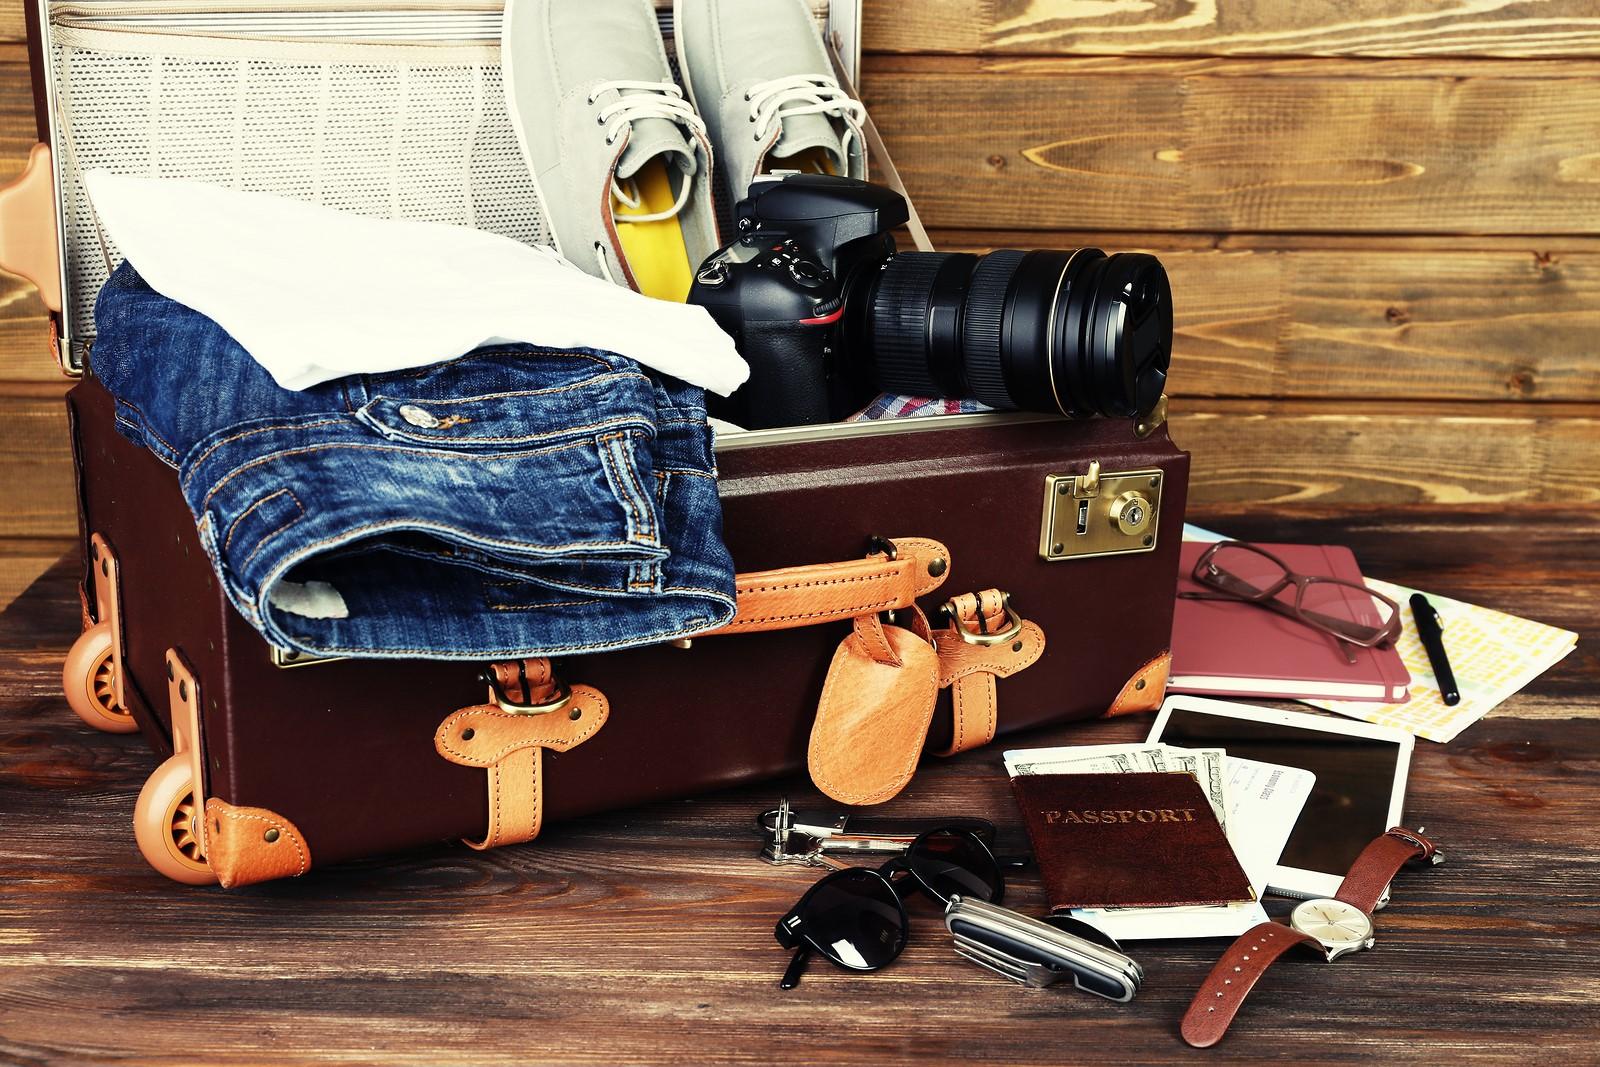 barang bawaan traveling